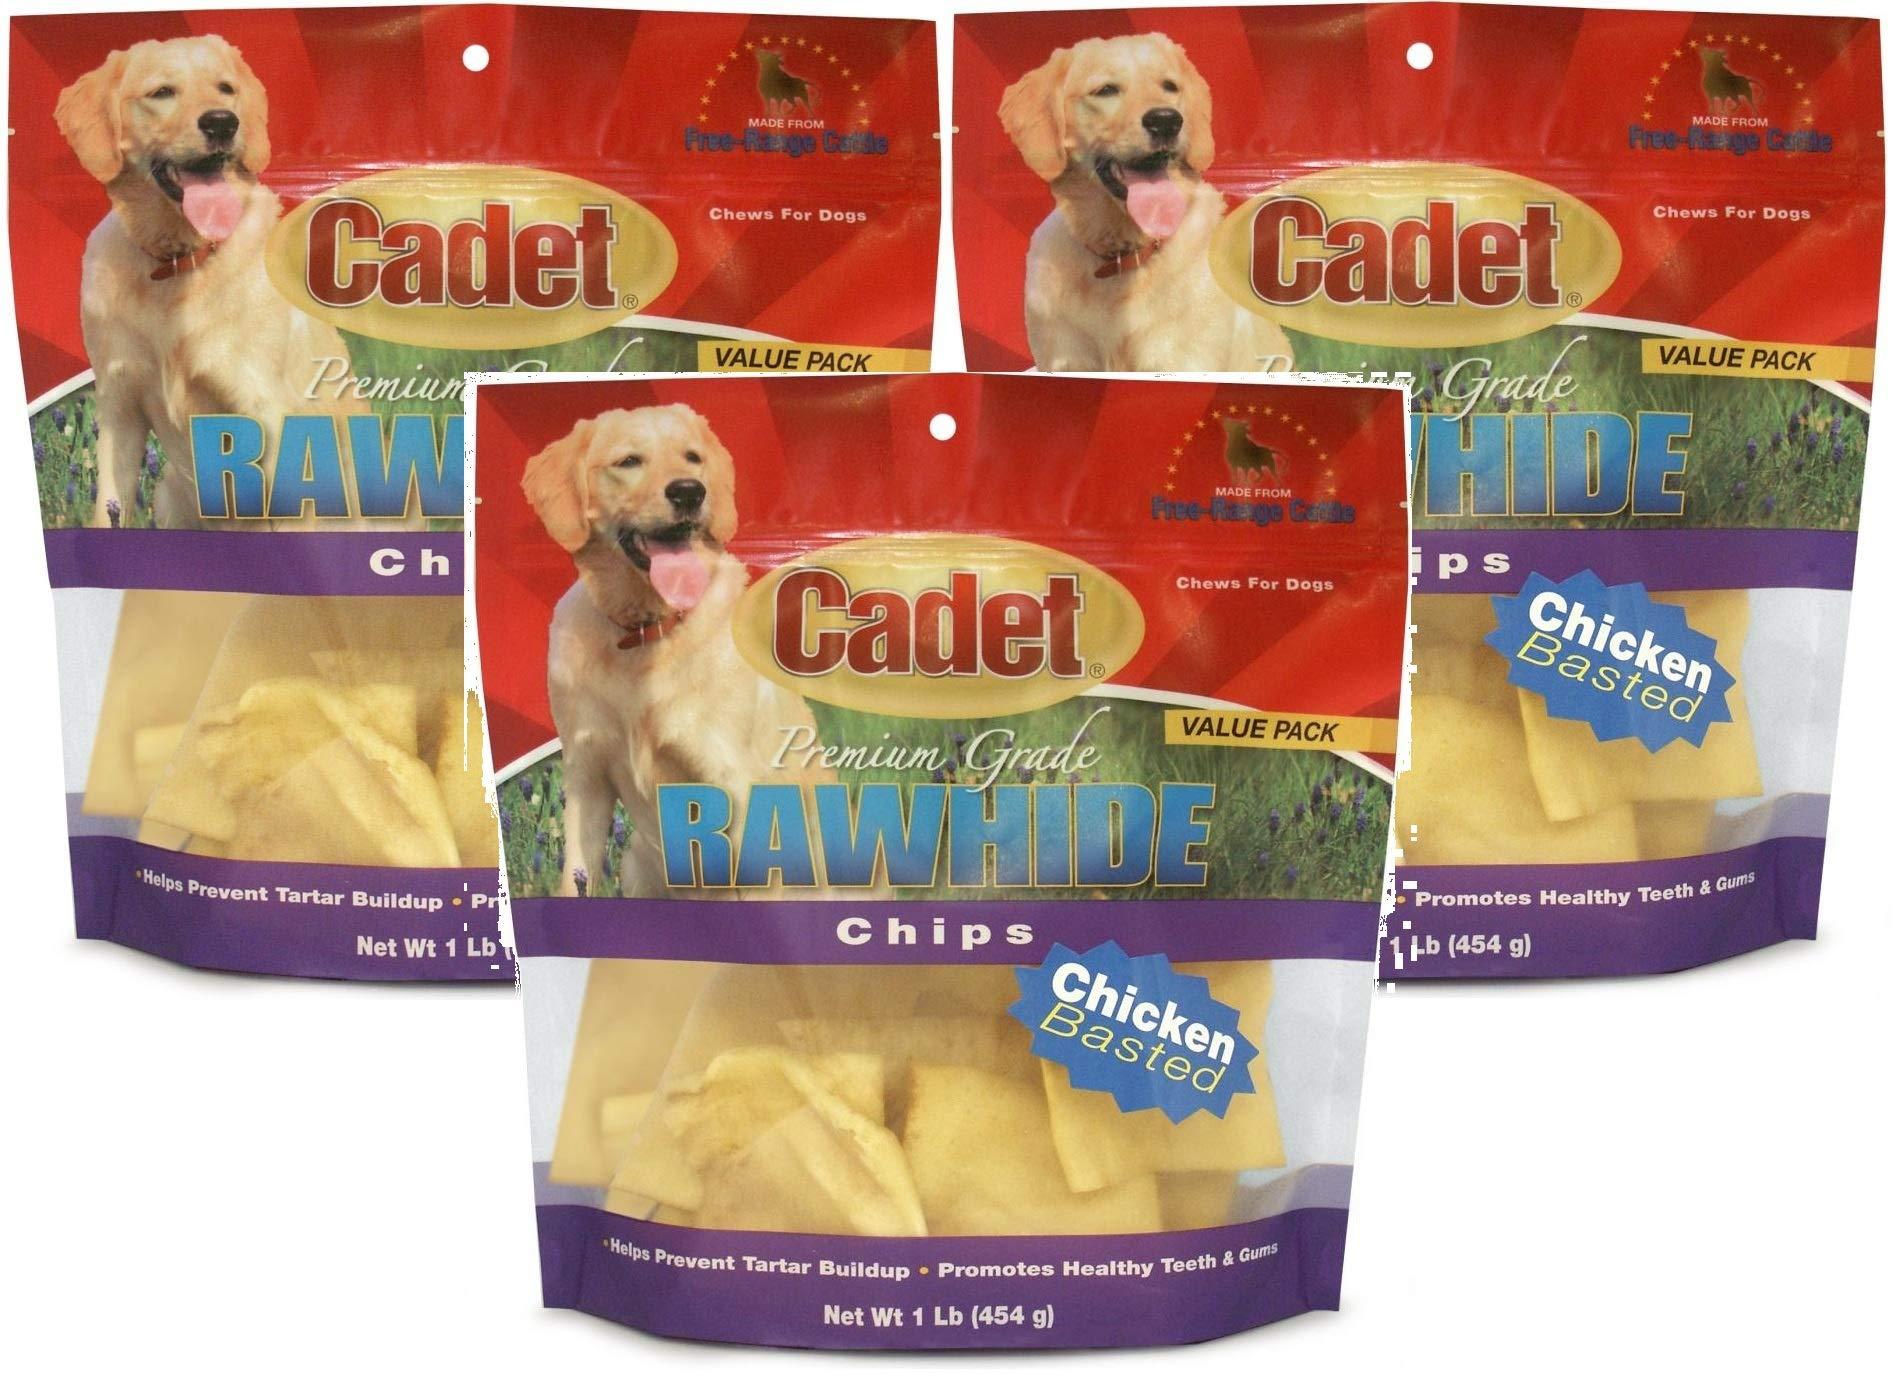 Cadet 3 Pack of Premium Grade Rawhide Chips, 1 Pound each, Chicken Basted